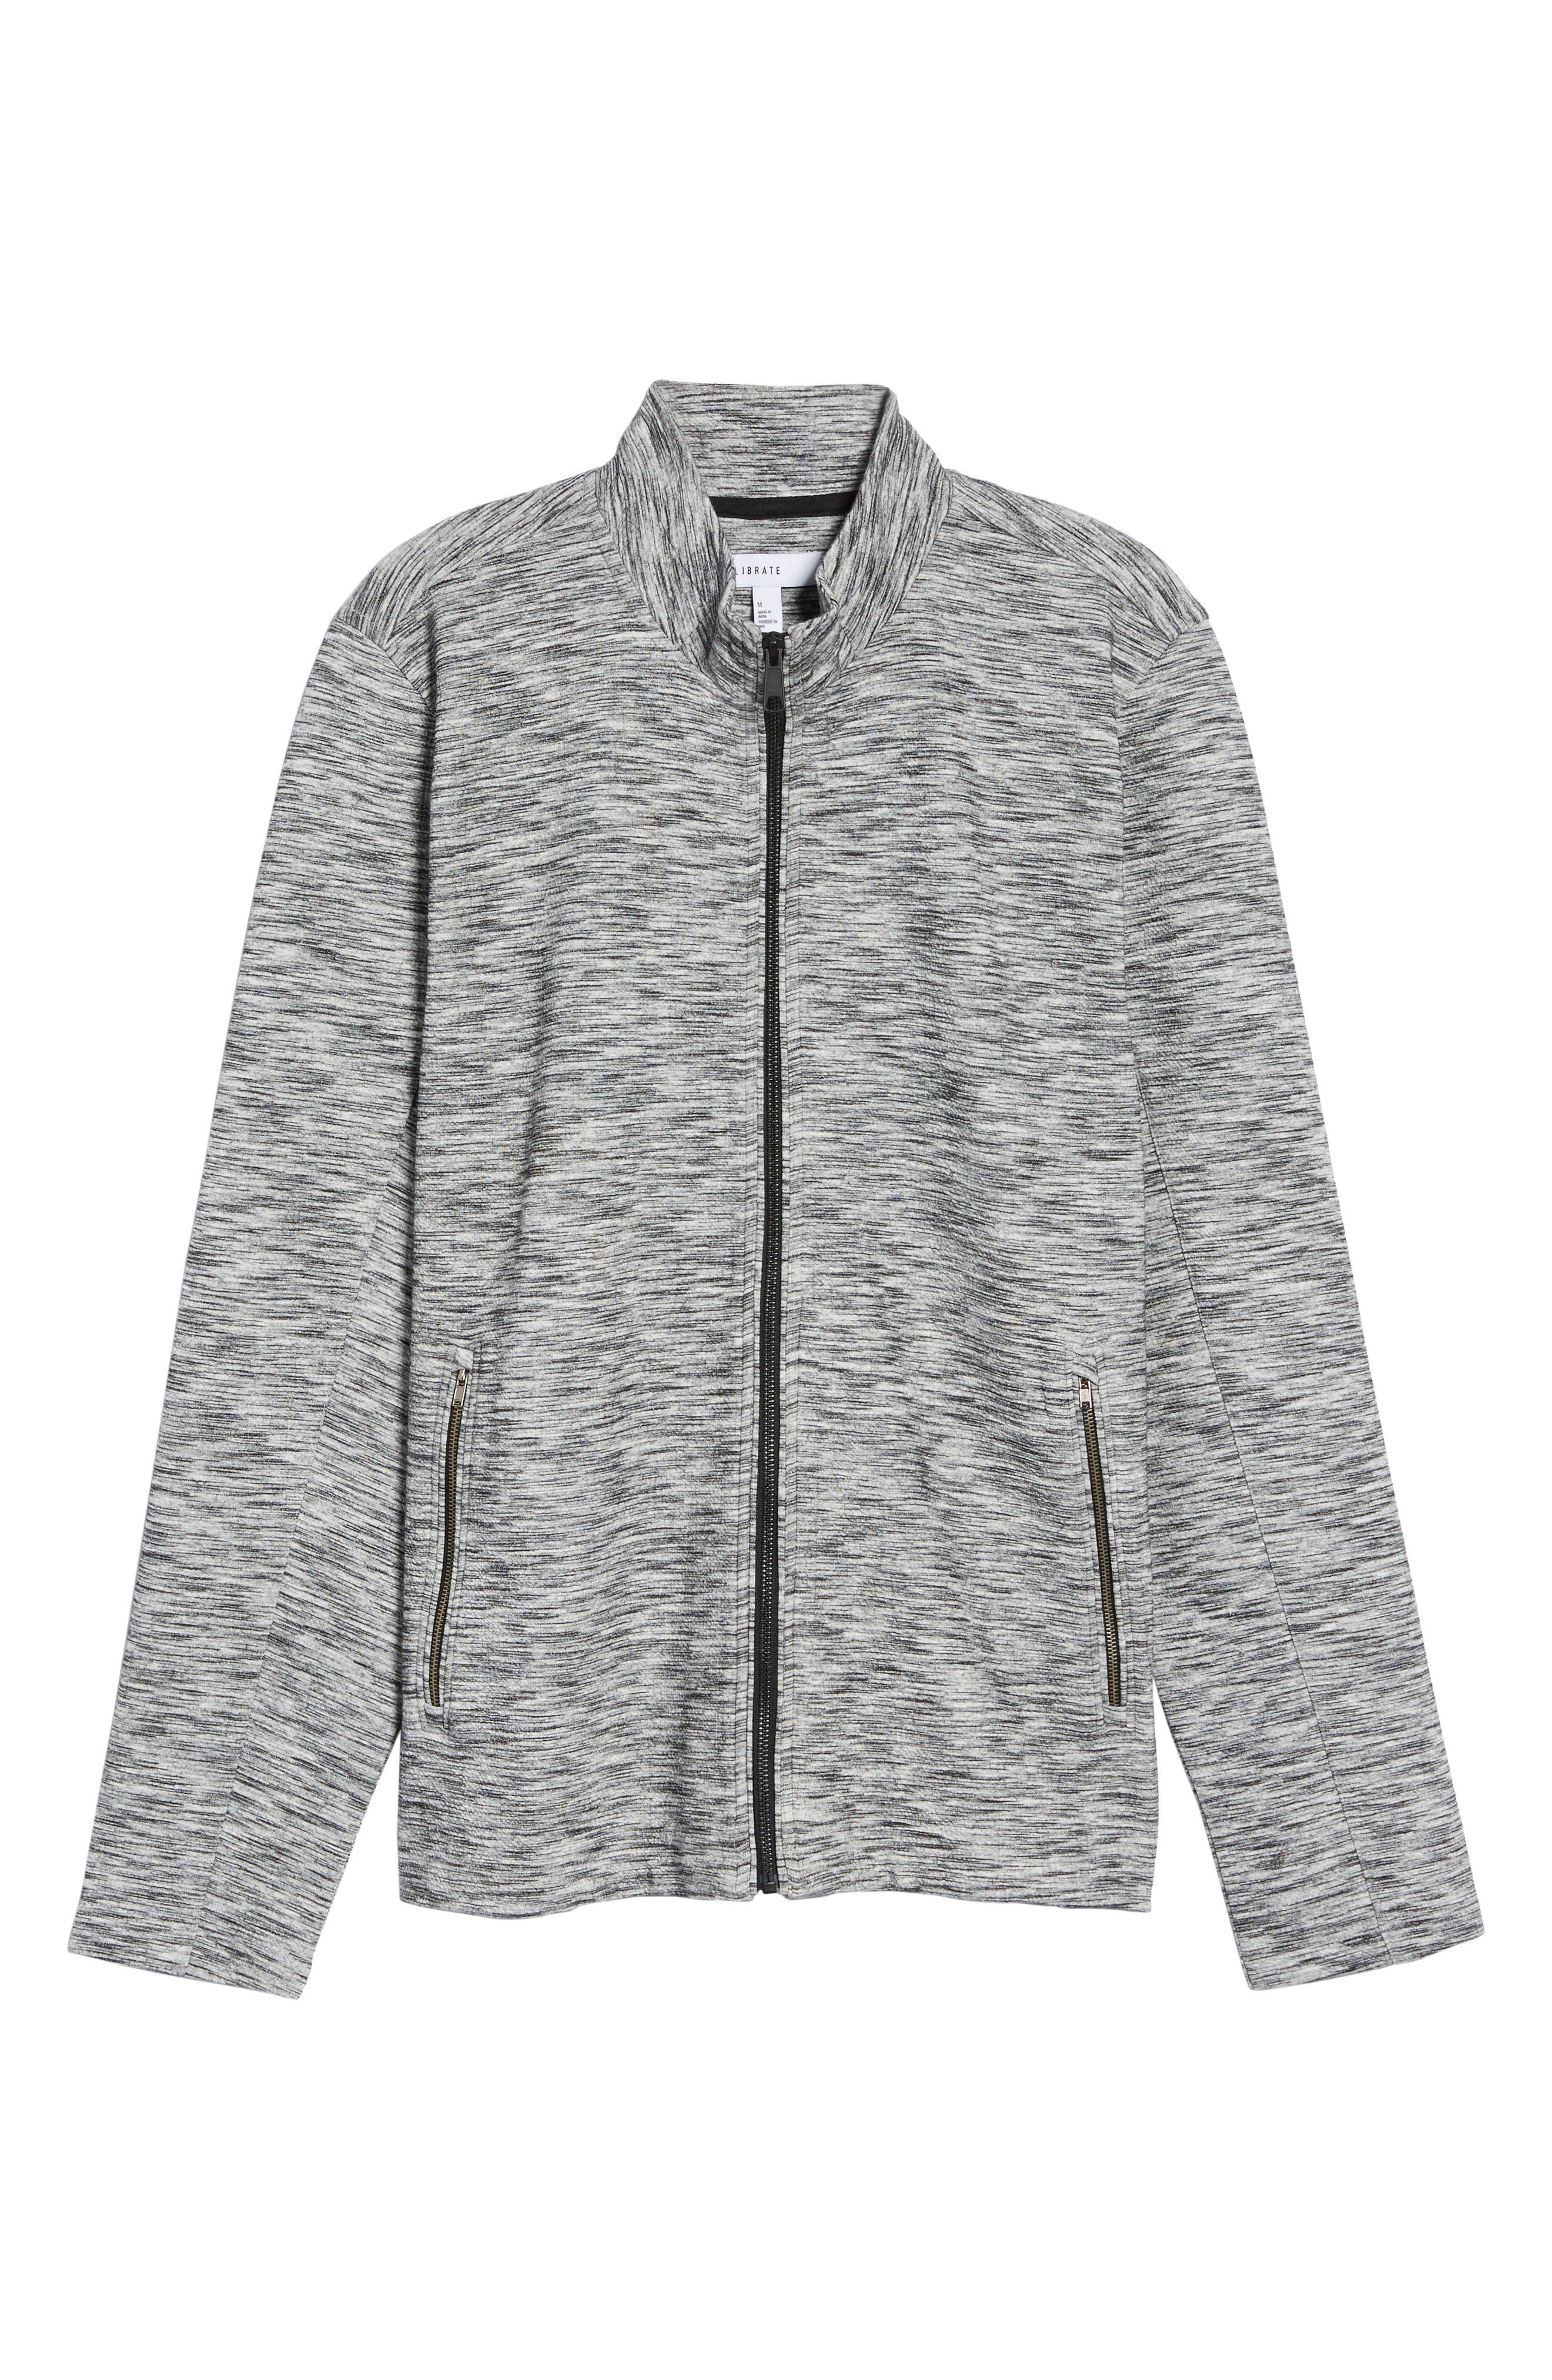 Knit Bomber Jacket,                             Alternate thumbnail 6, color,                             Grey Lunar Spacedye